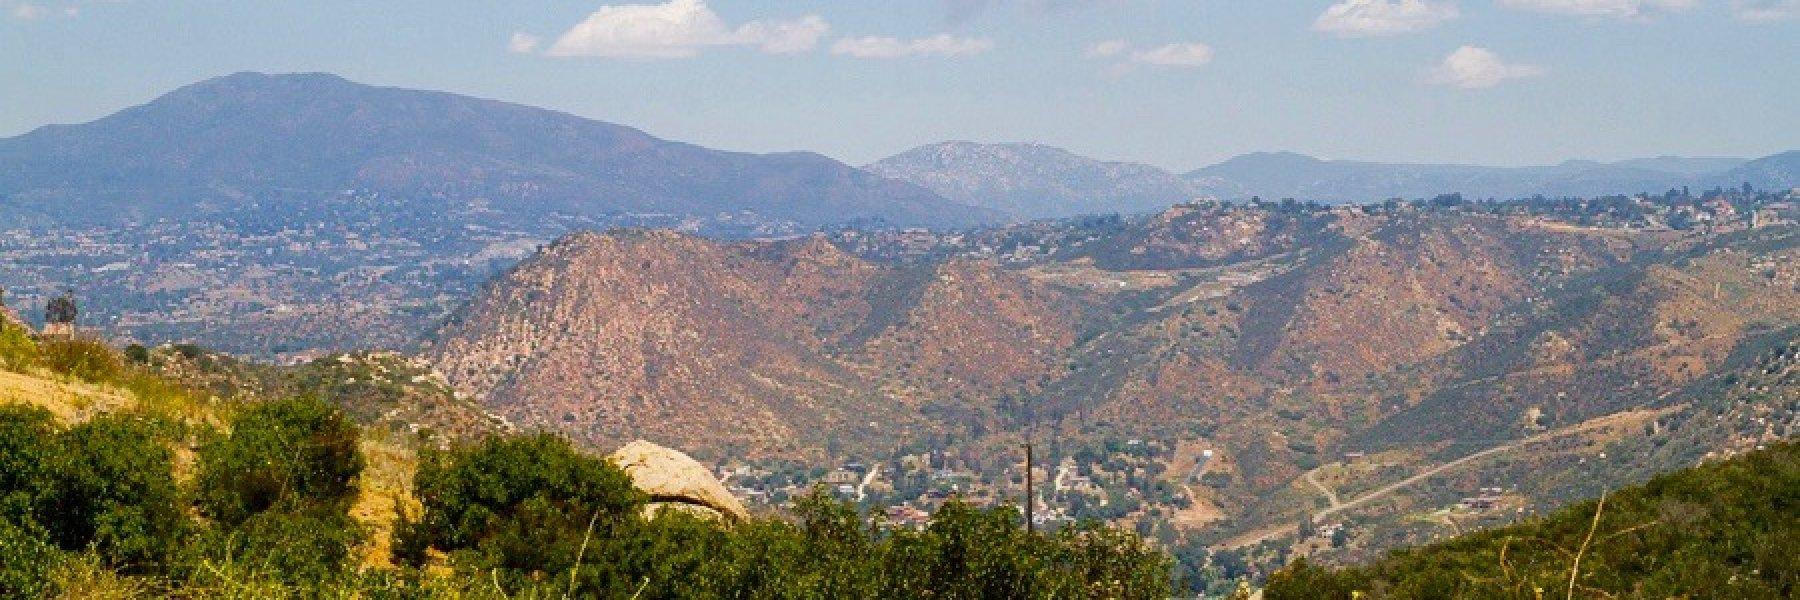 Crest Neighborhood in El Cajon